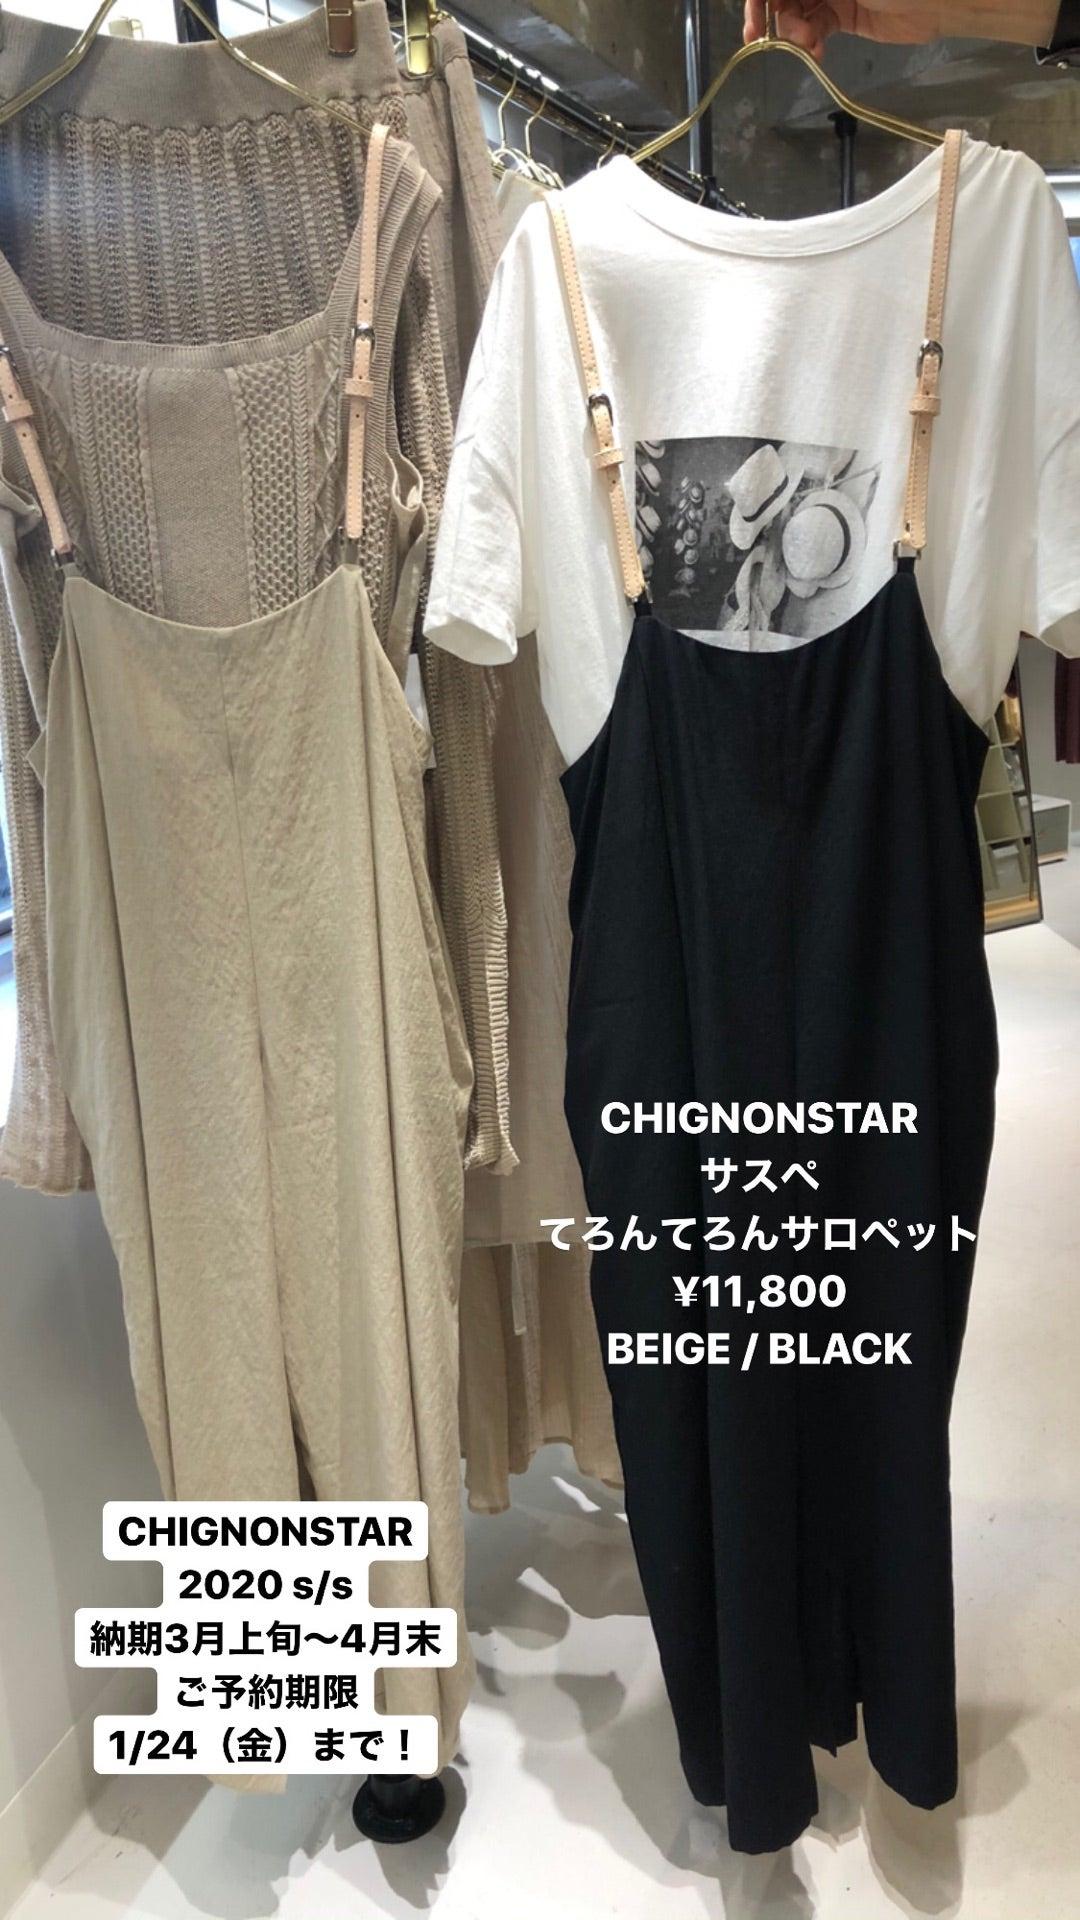 「CHIGNONSTAR 」展示会速報